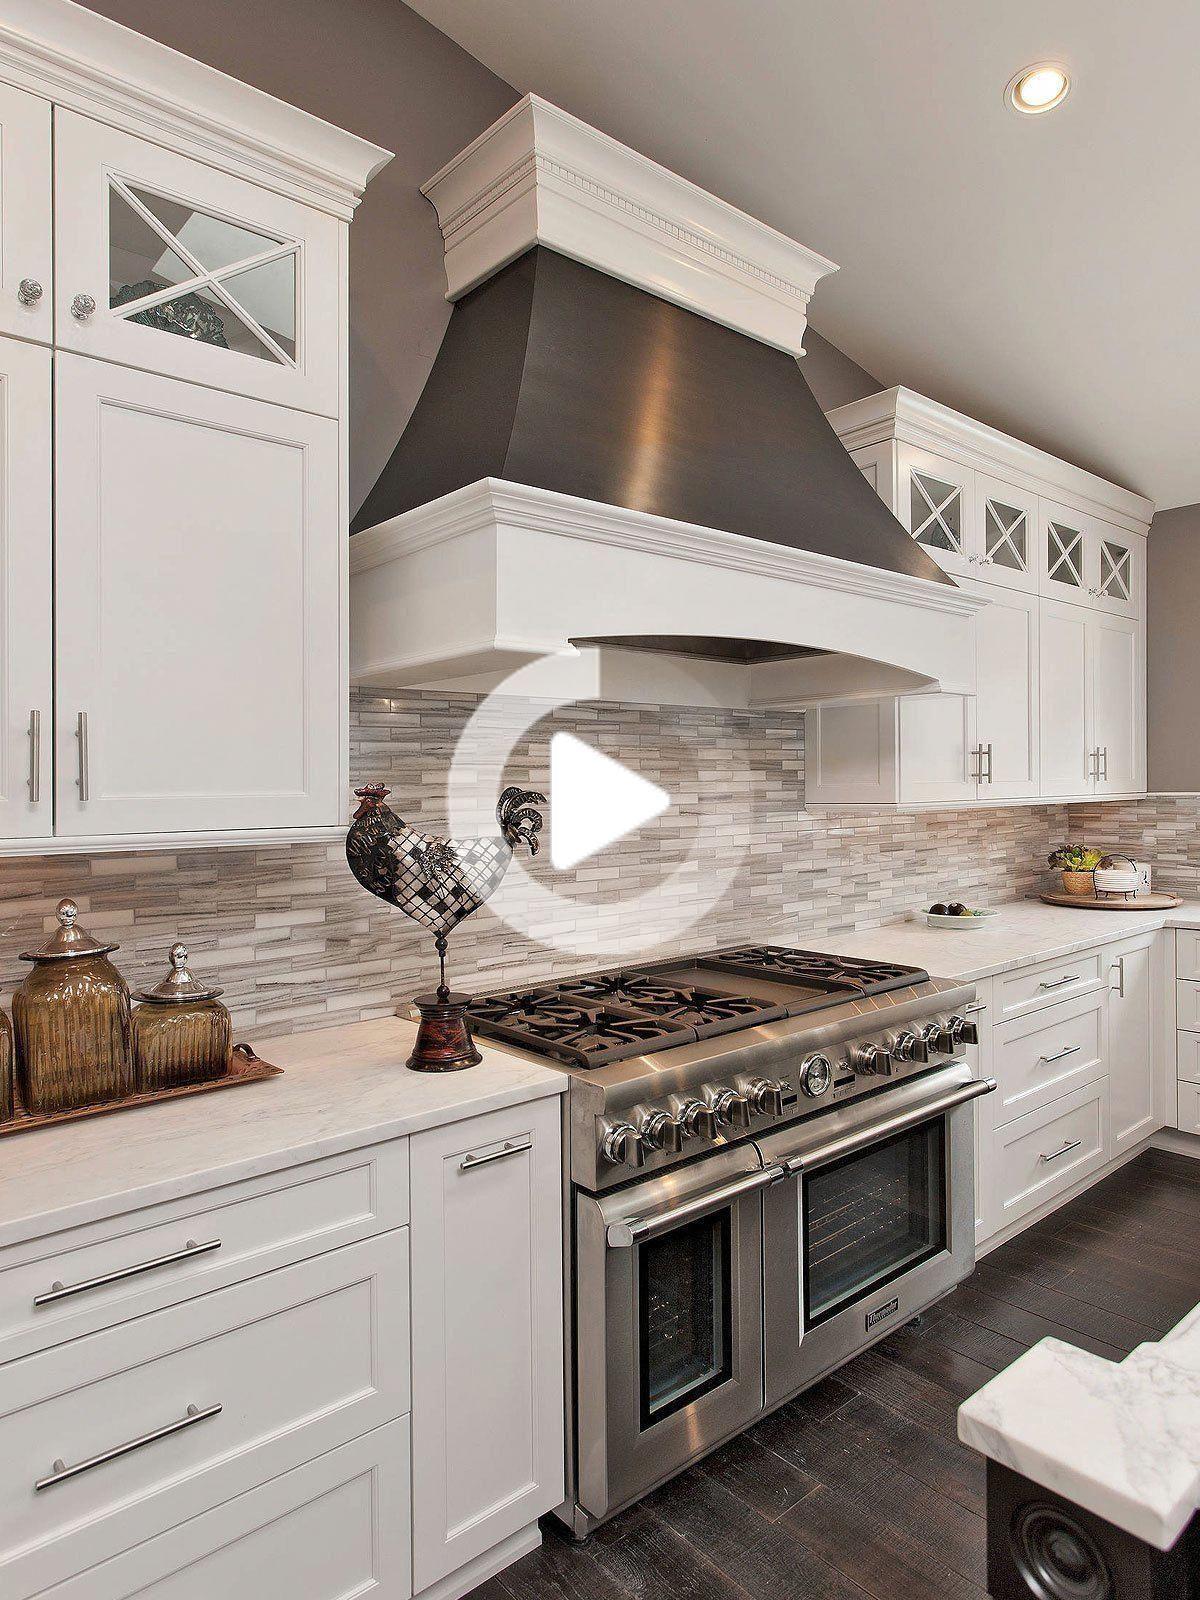 Modern White Gray Subway Marble Backsplash Tile In 2020 White Kitchen Design Kitchen Style Kitchen Layout